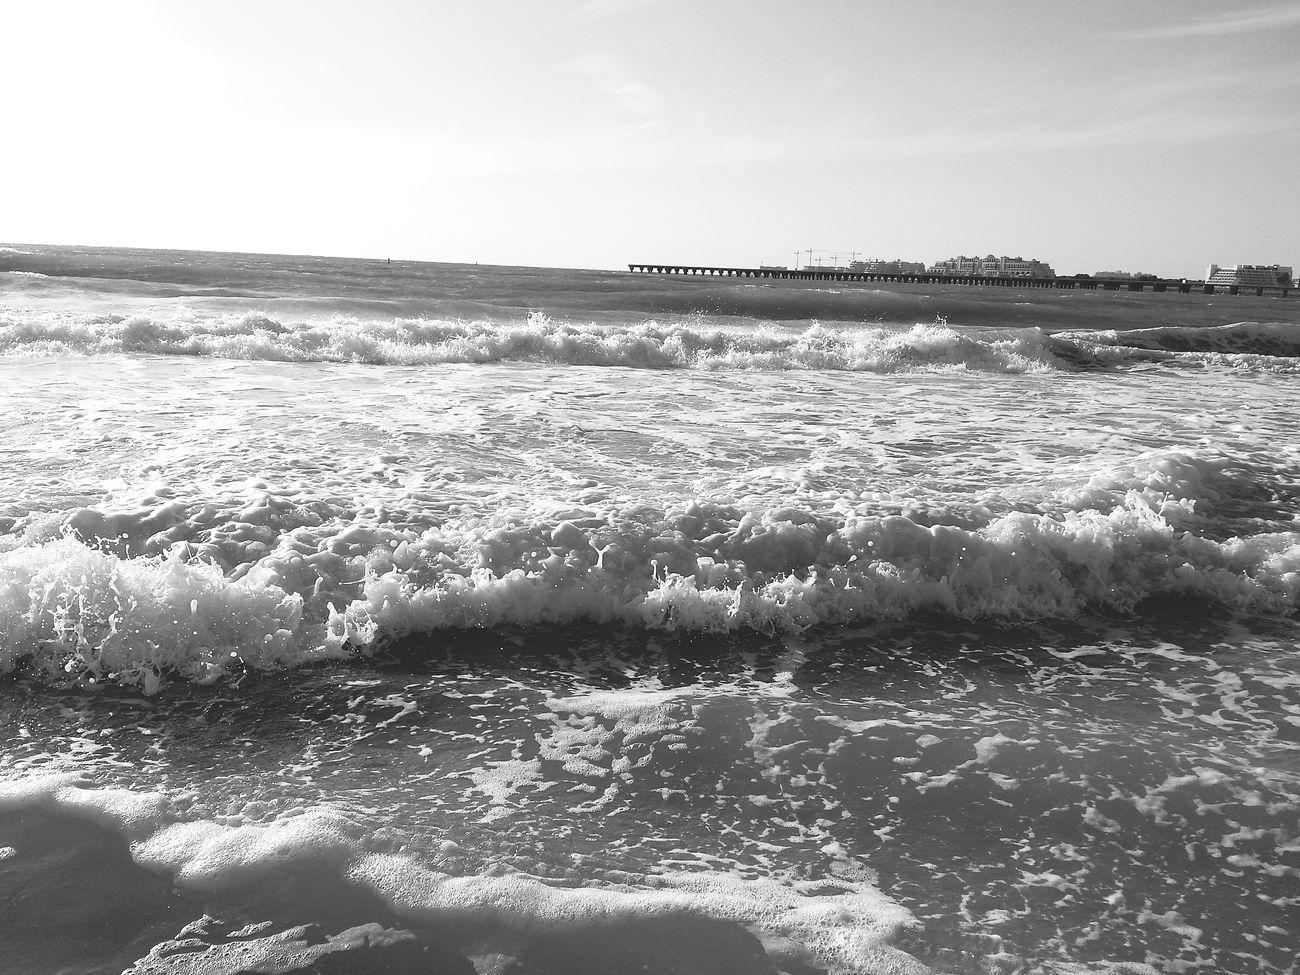 Sea Water Waves Surf Photo Of The Day Dubai UAE Dubai UAE OpenEdit Getting Inspired Nature Jumeirahbeachresidence Popular Open Edit Hello World Vscocam Samsung Galaxy S4 Dubailife Marina Beach, Dubai VSCO Marina Walk Jumeira Jbr First Eyeem Photo